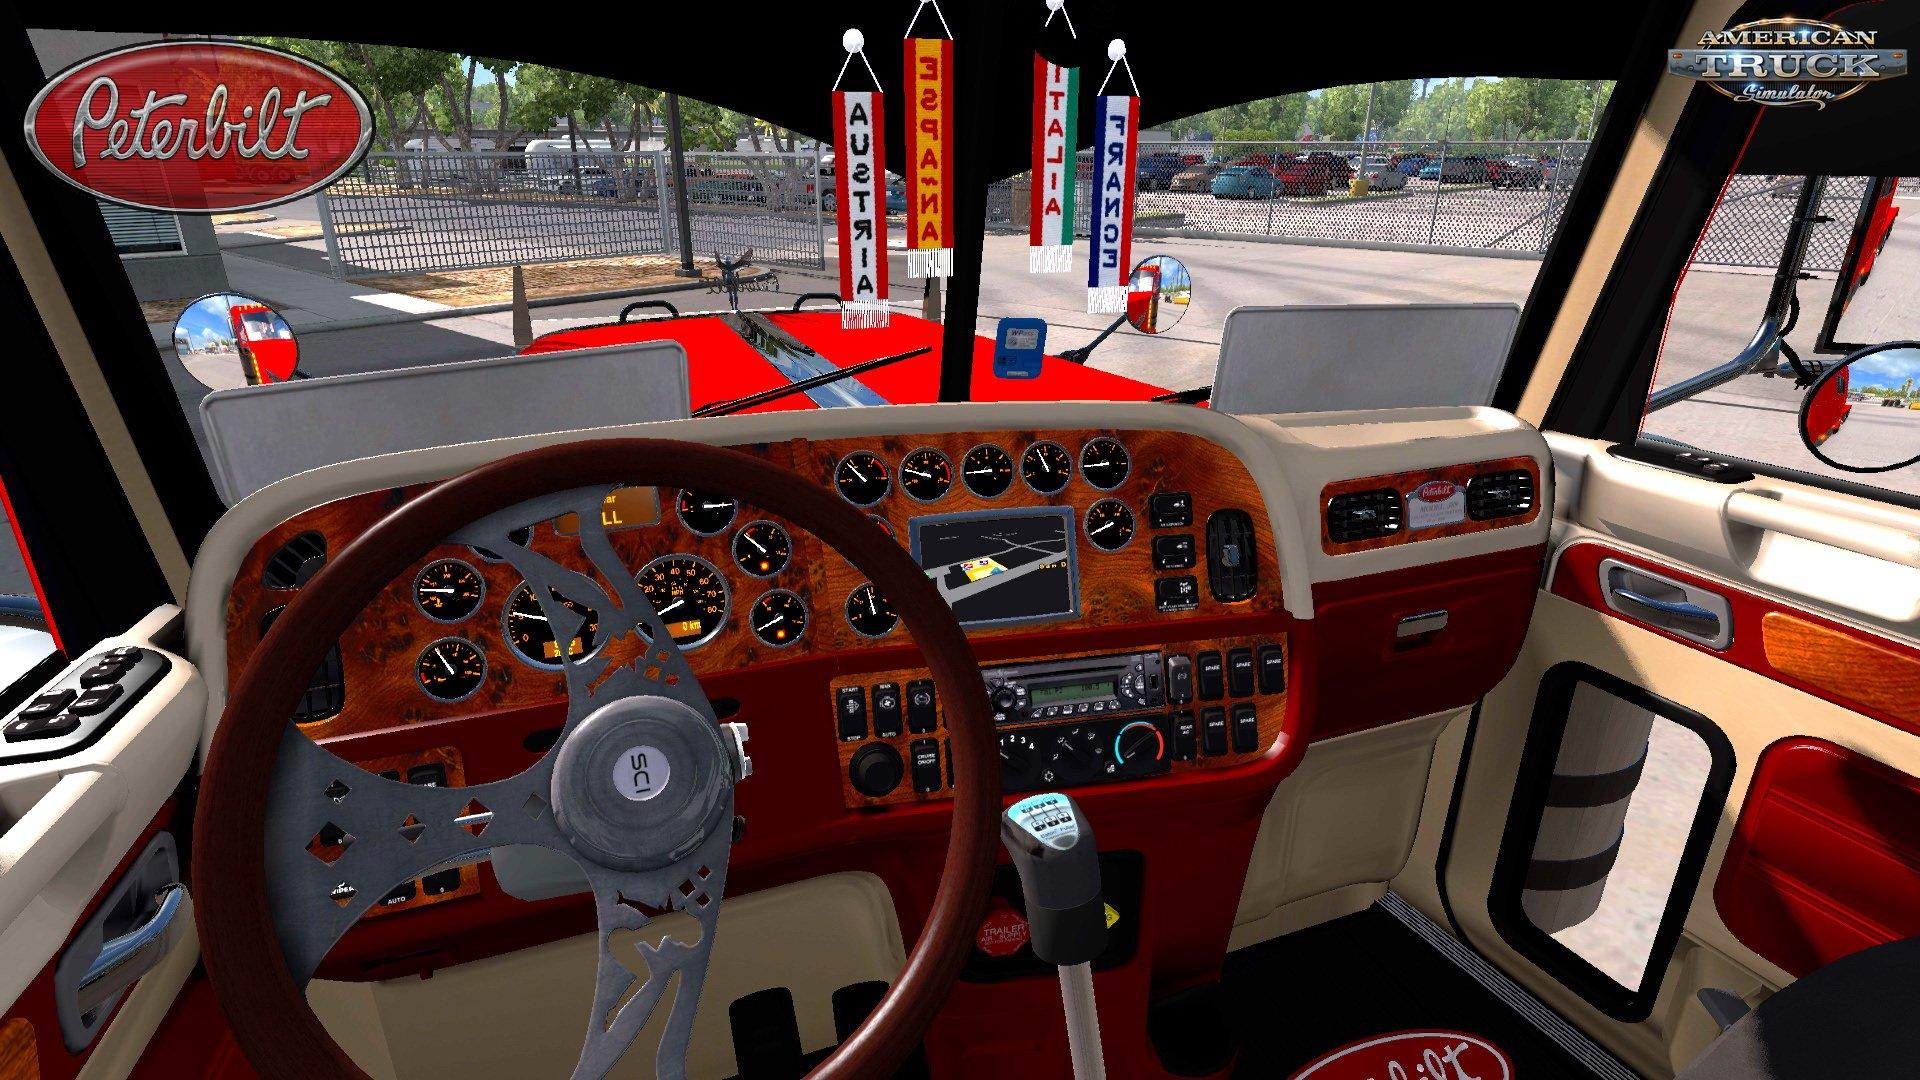 Nice Modified Peterbilt 389 + Interior V2.1 (1.28.x) American Truck Simulator  Game. Design Ideas